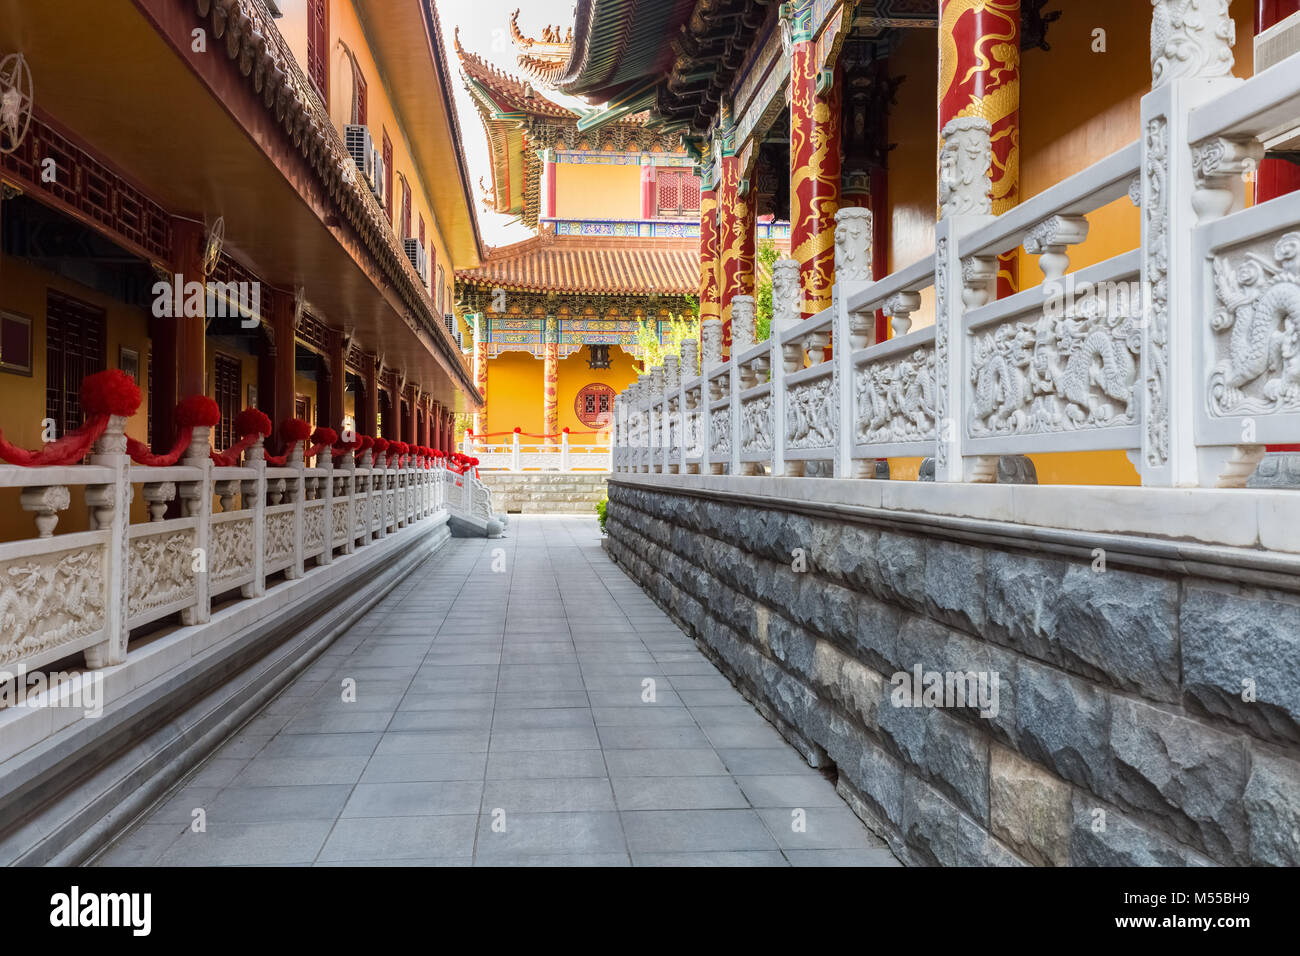 buddhist temple courtyards closeup - Stock Image